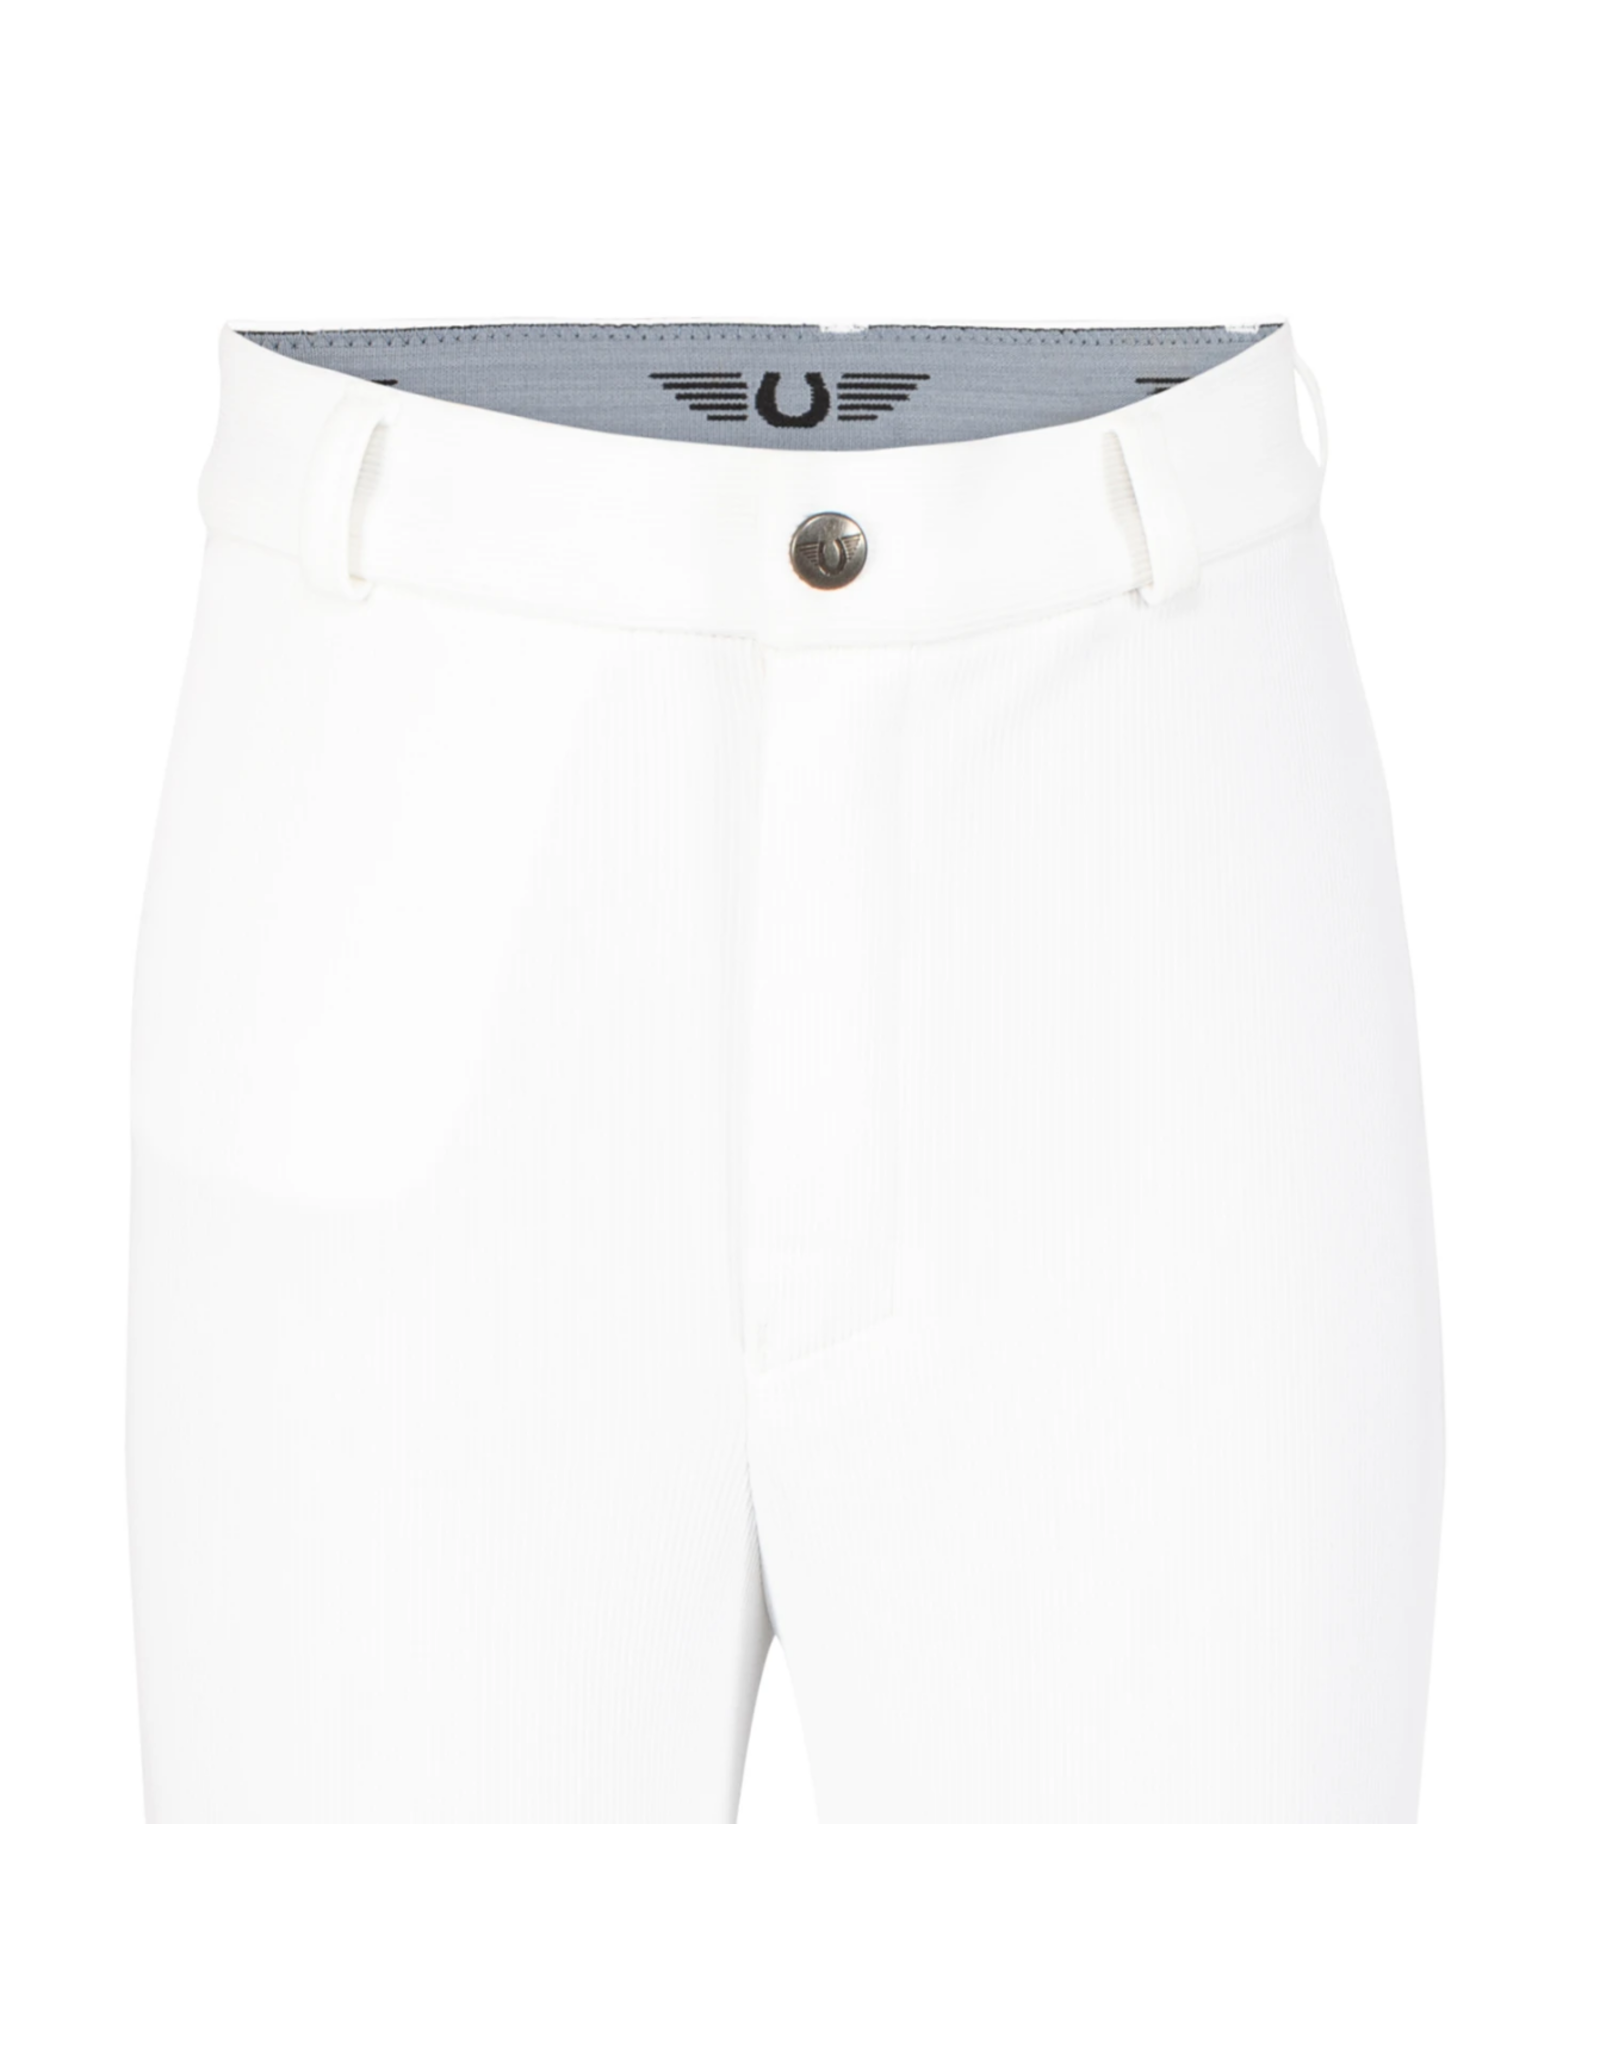 Tuffrider Children's Ribb Knee Patch Breeches White